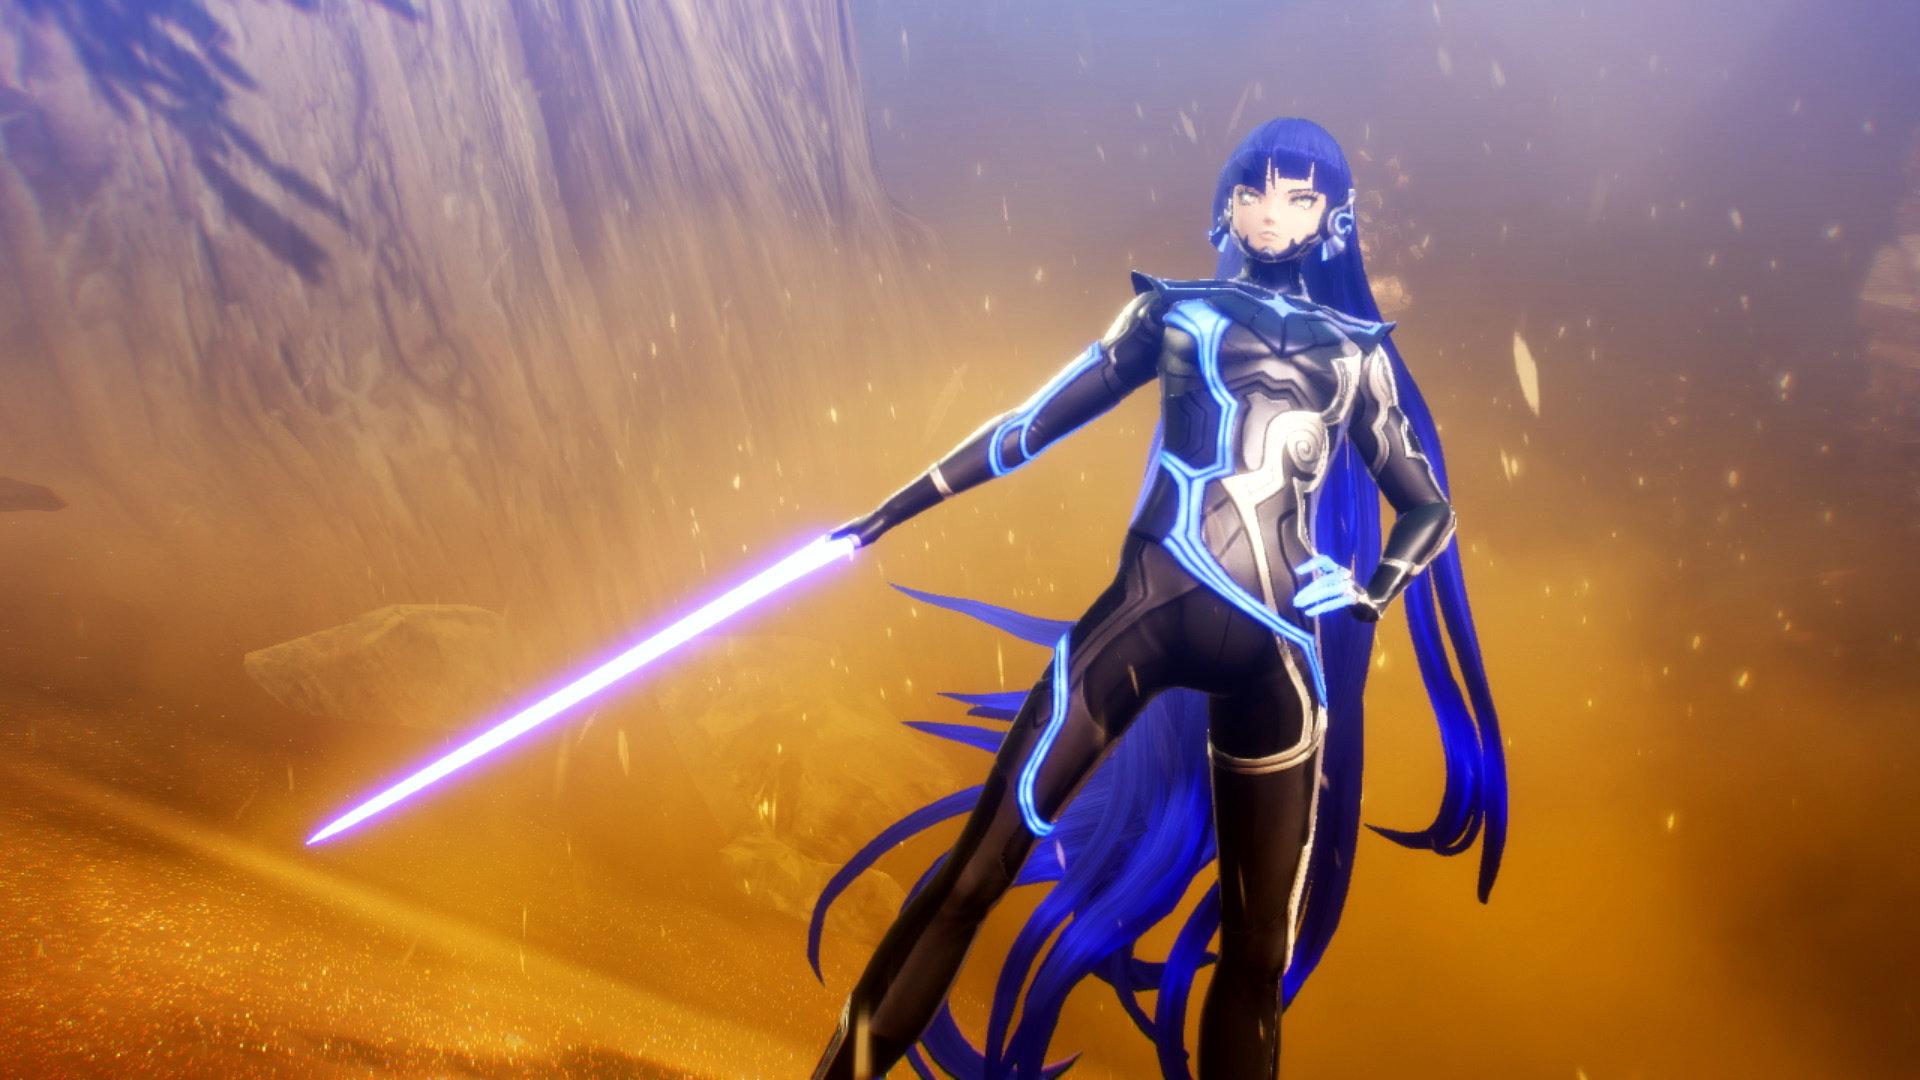 Shin Megami Tensei V screenshot of Nahobino brandishing a laser sword in a dusty wasteland.